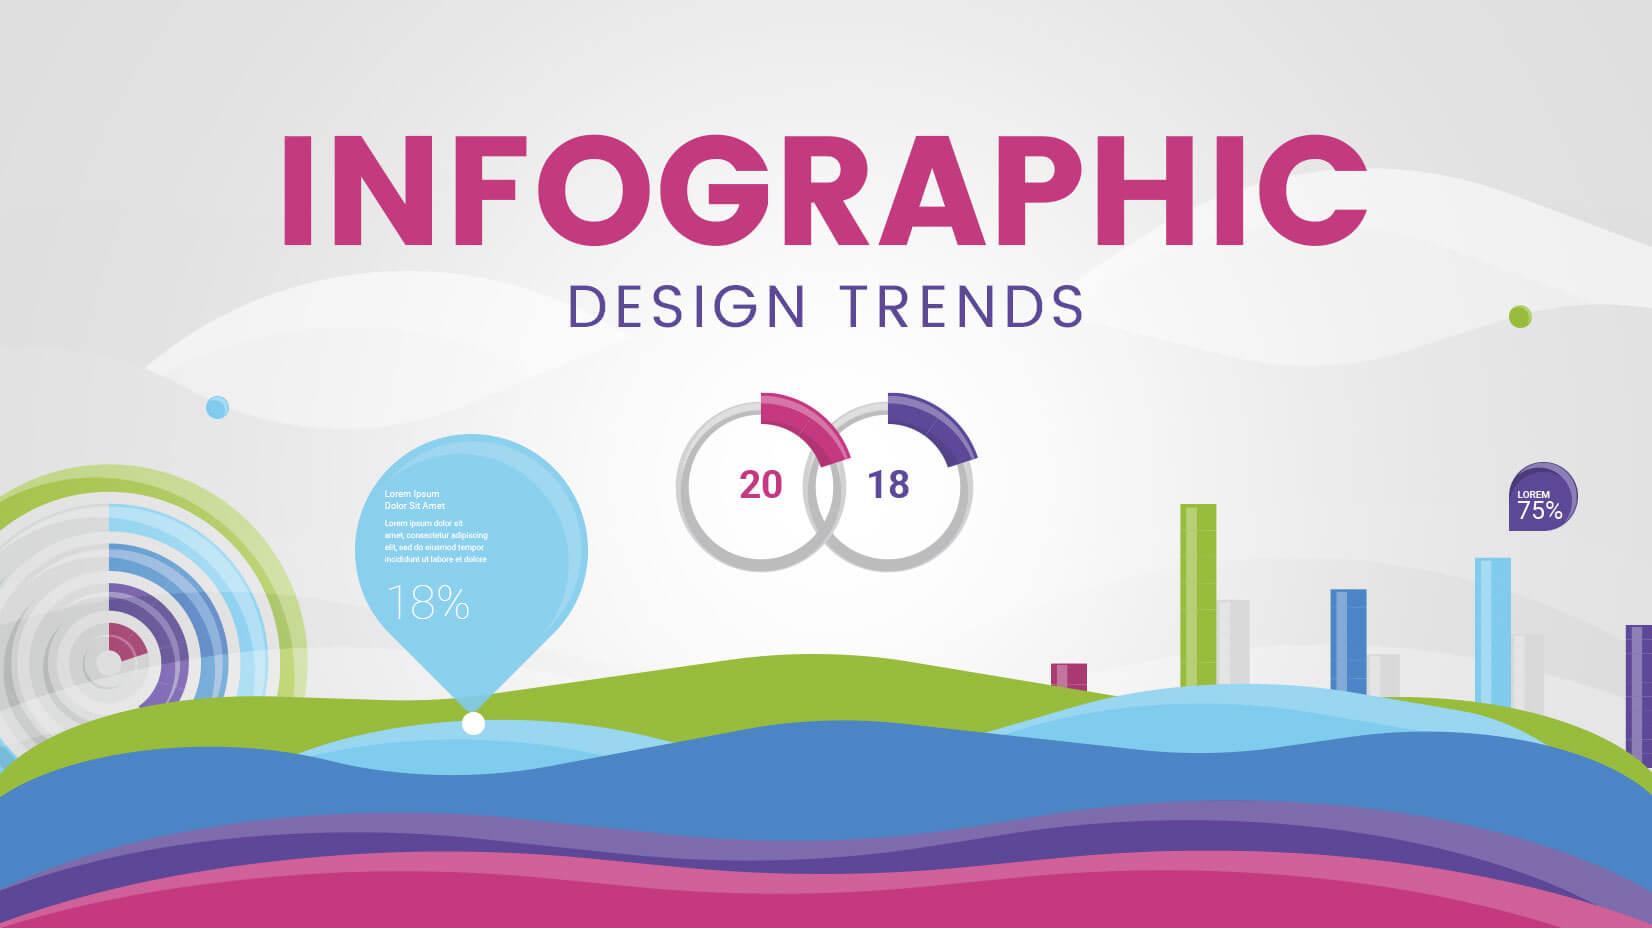 Infographic design trends 2018